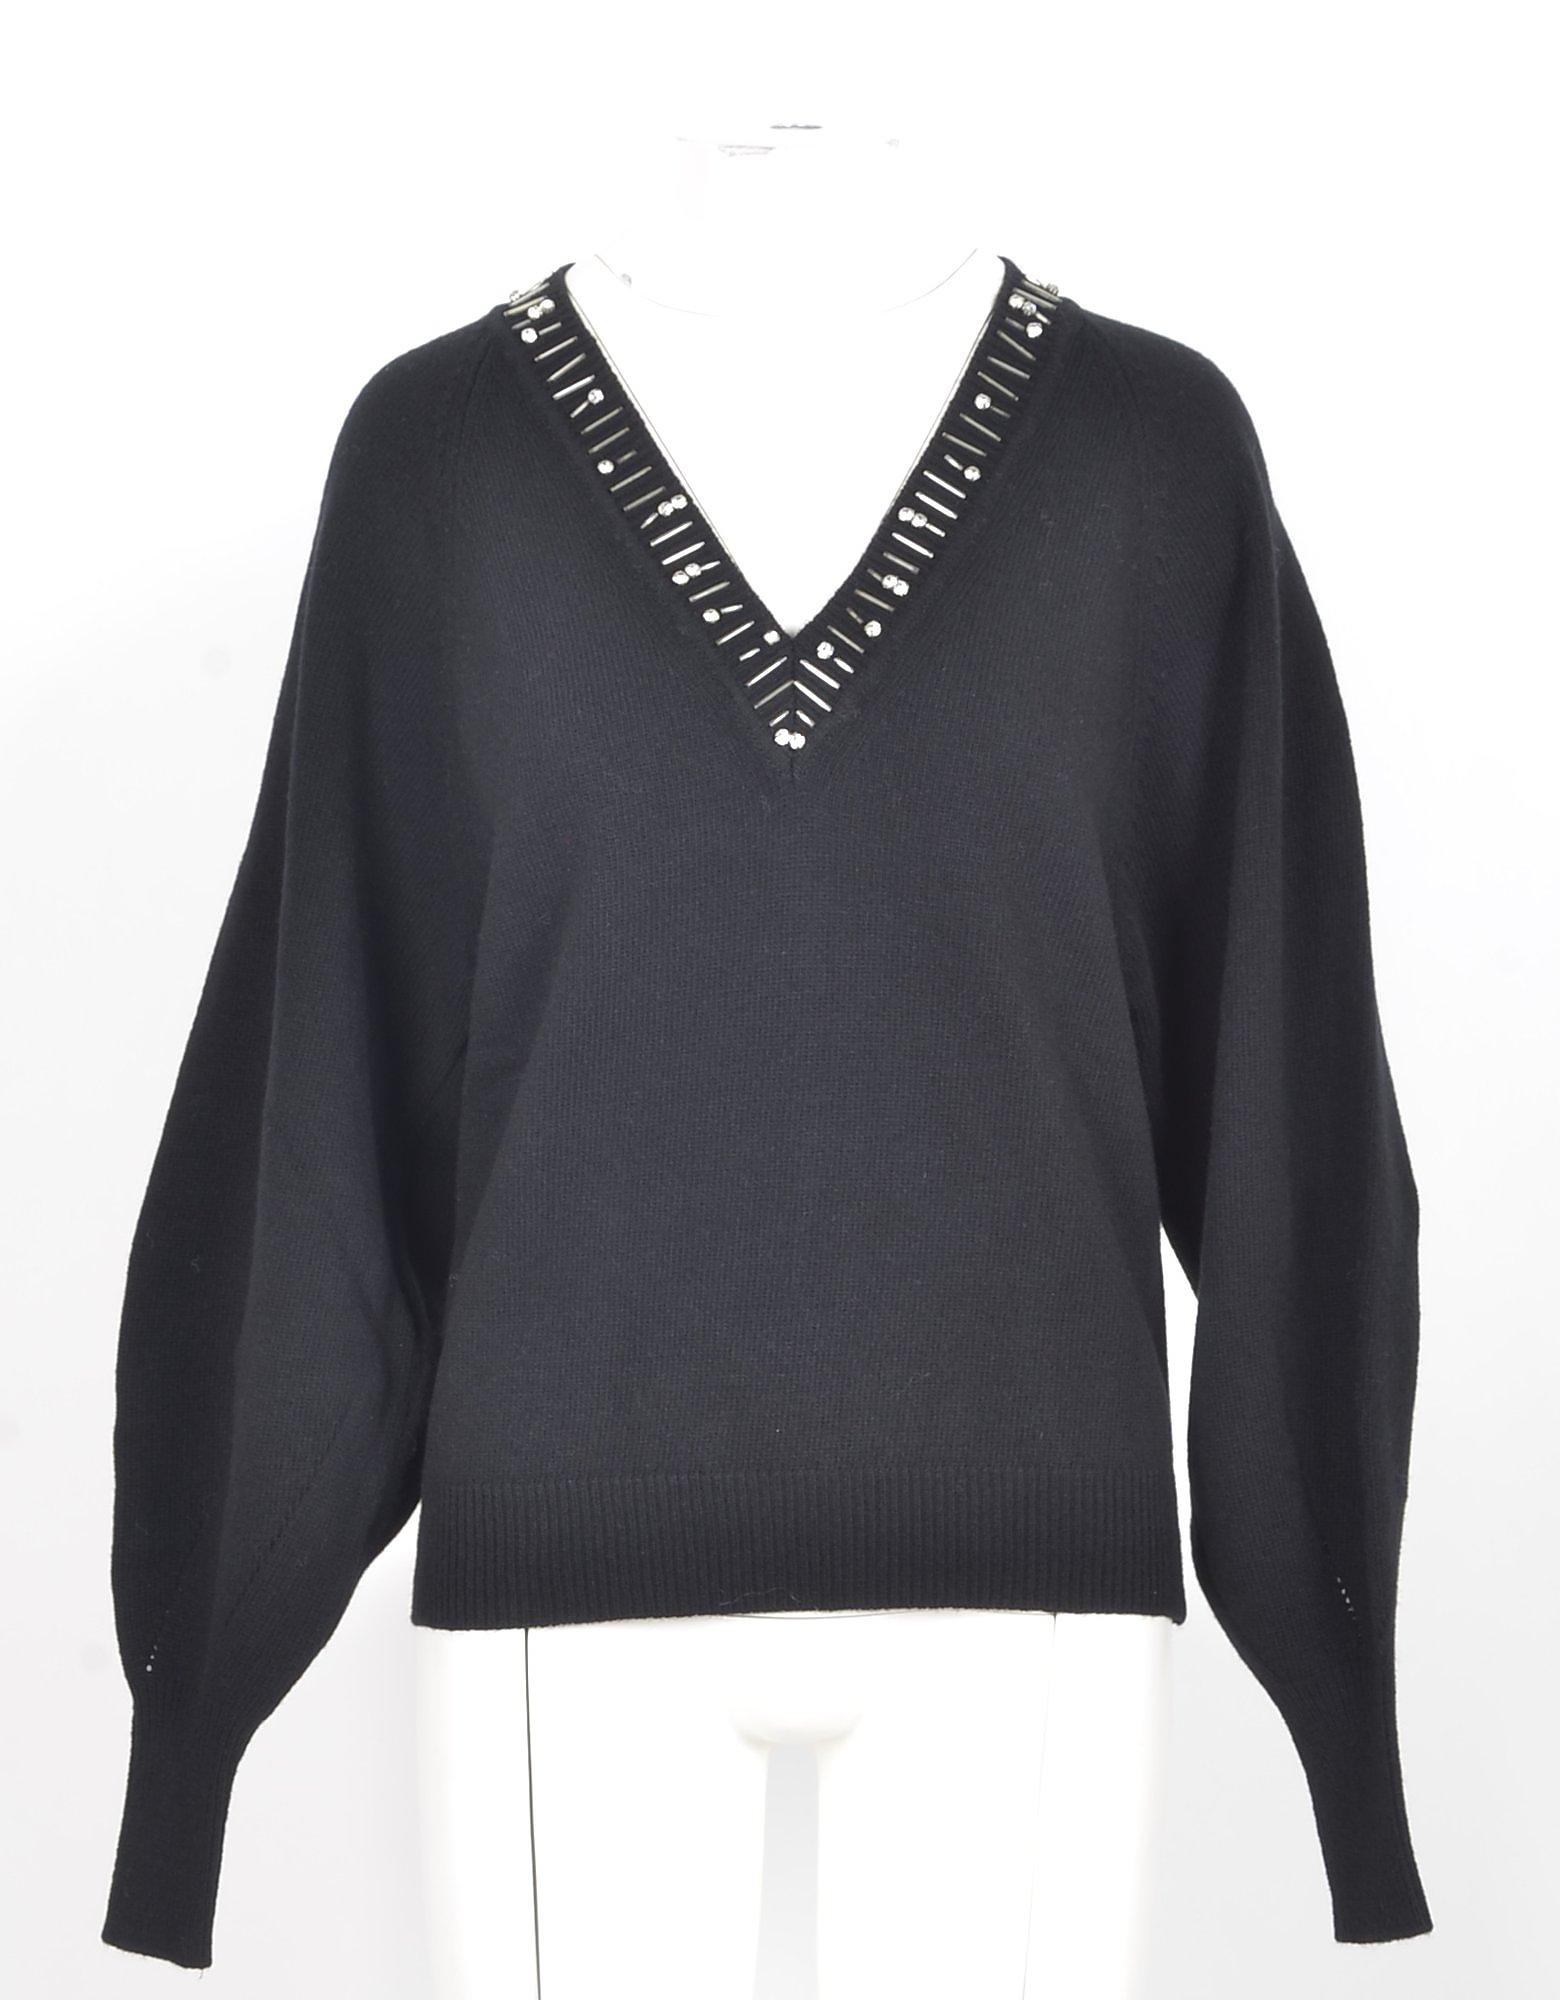 Pinko Designer Knitwear, Black Wool Women's V-Neck Sweater